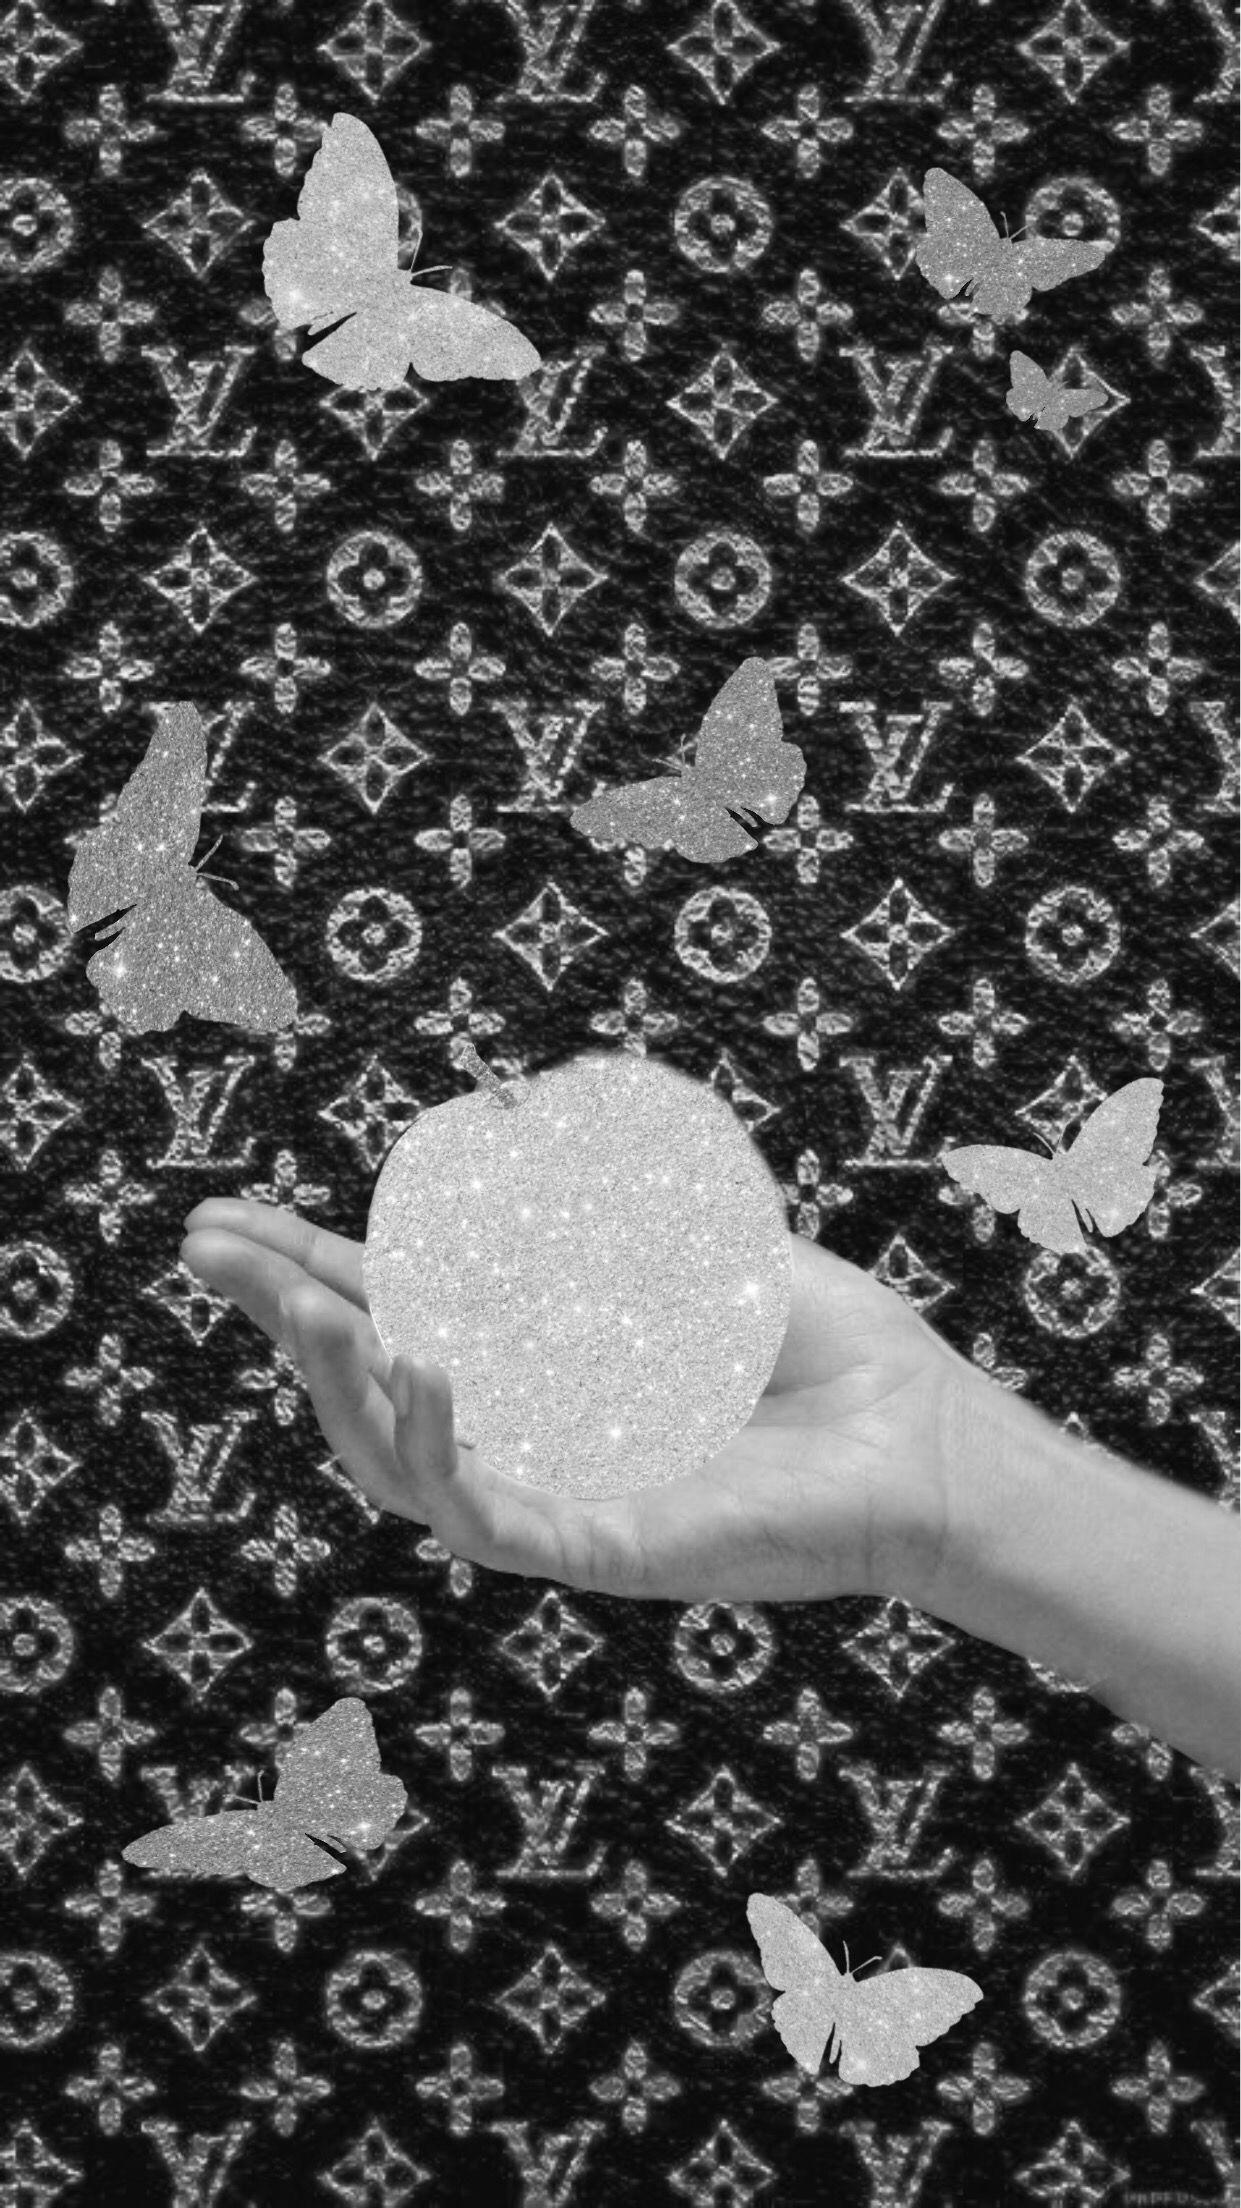 Glitter Sparkle Apple B W Black Aesthetic Wallpaper Black Glitter Wallpapers Black And White Picture Wall